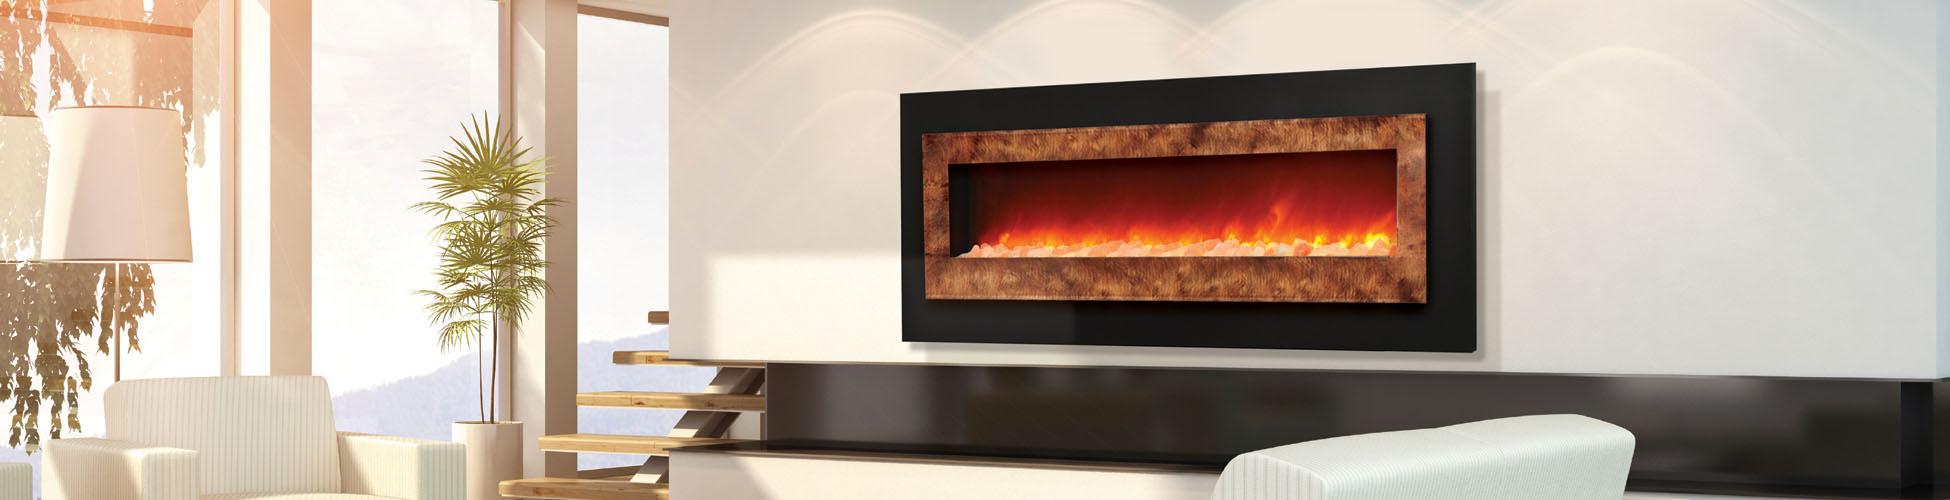 WM-FML-85 electric fireplace by Sierra Flame